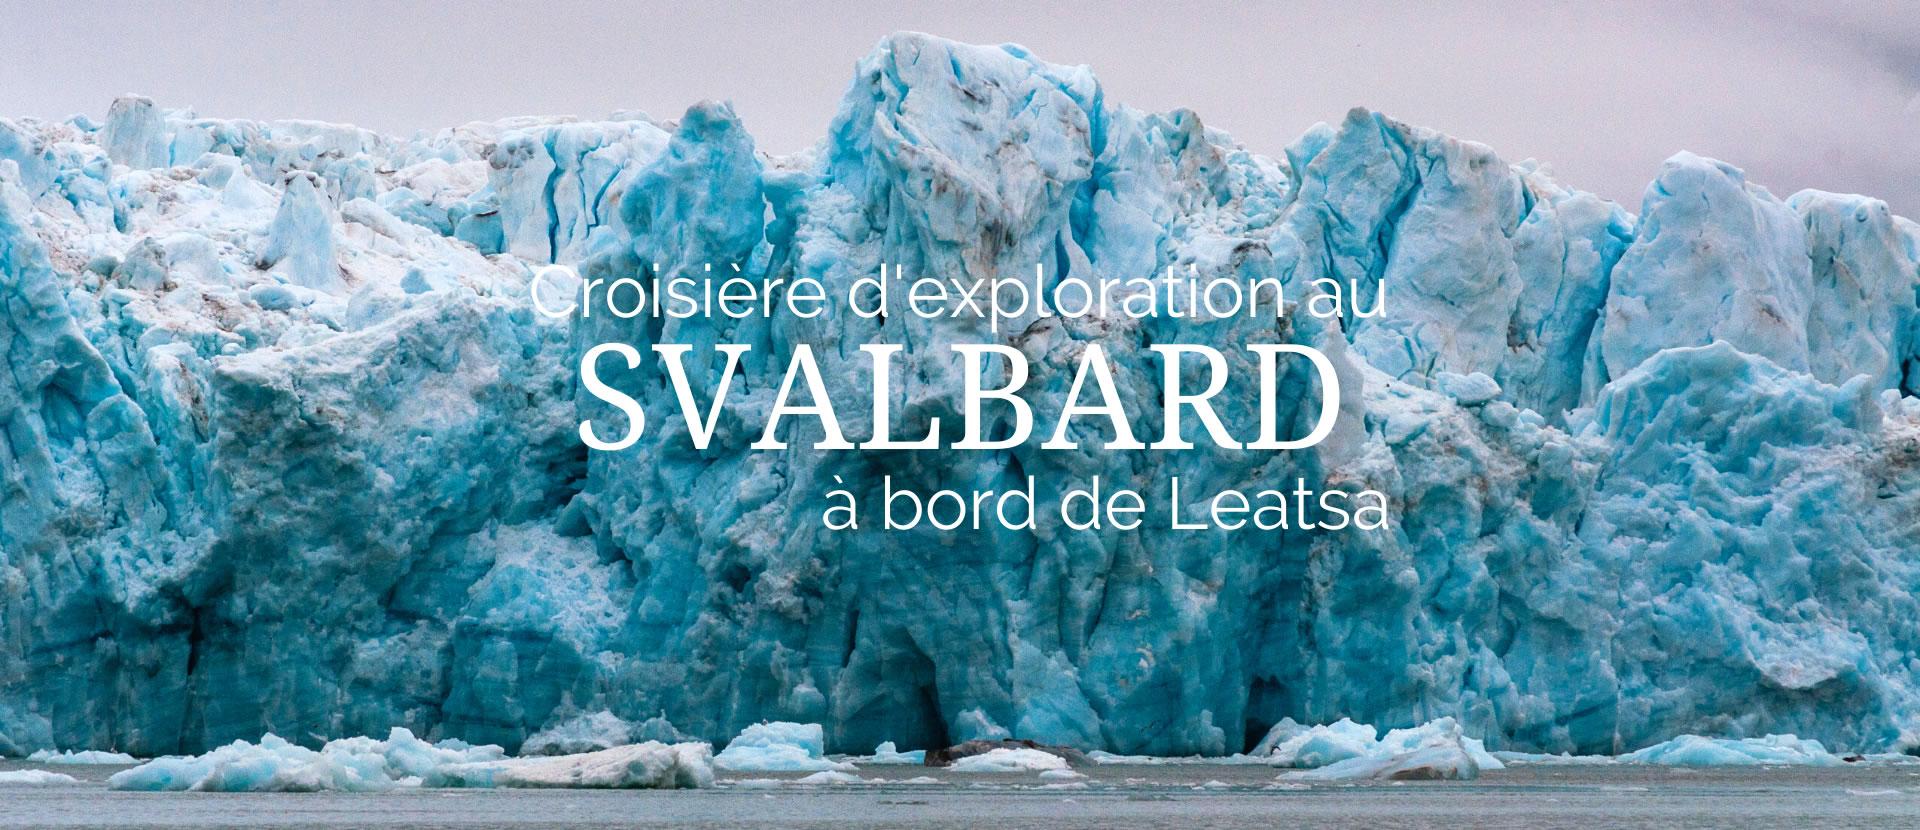 Svalbard2020-01